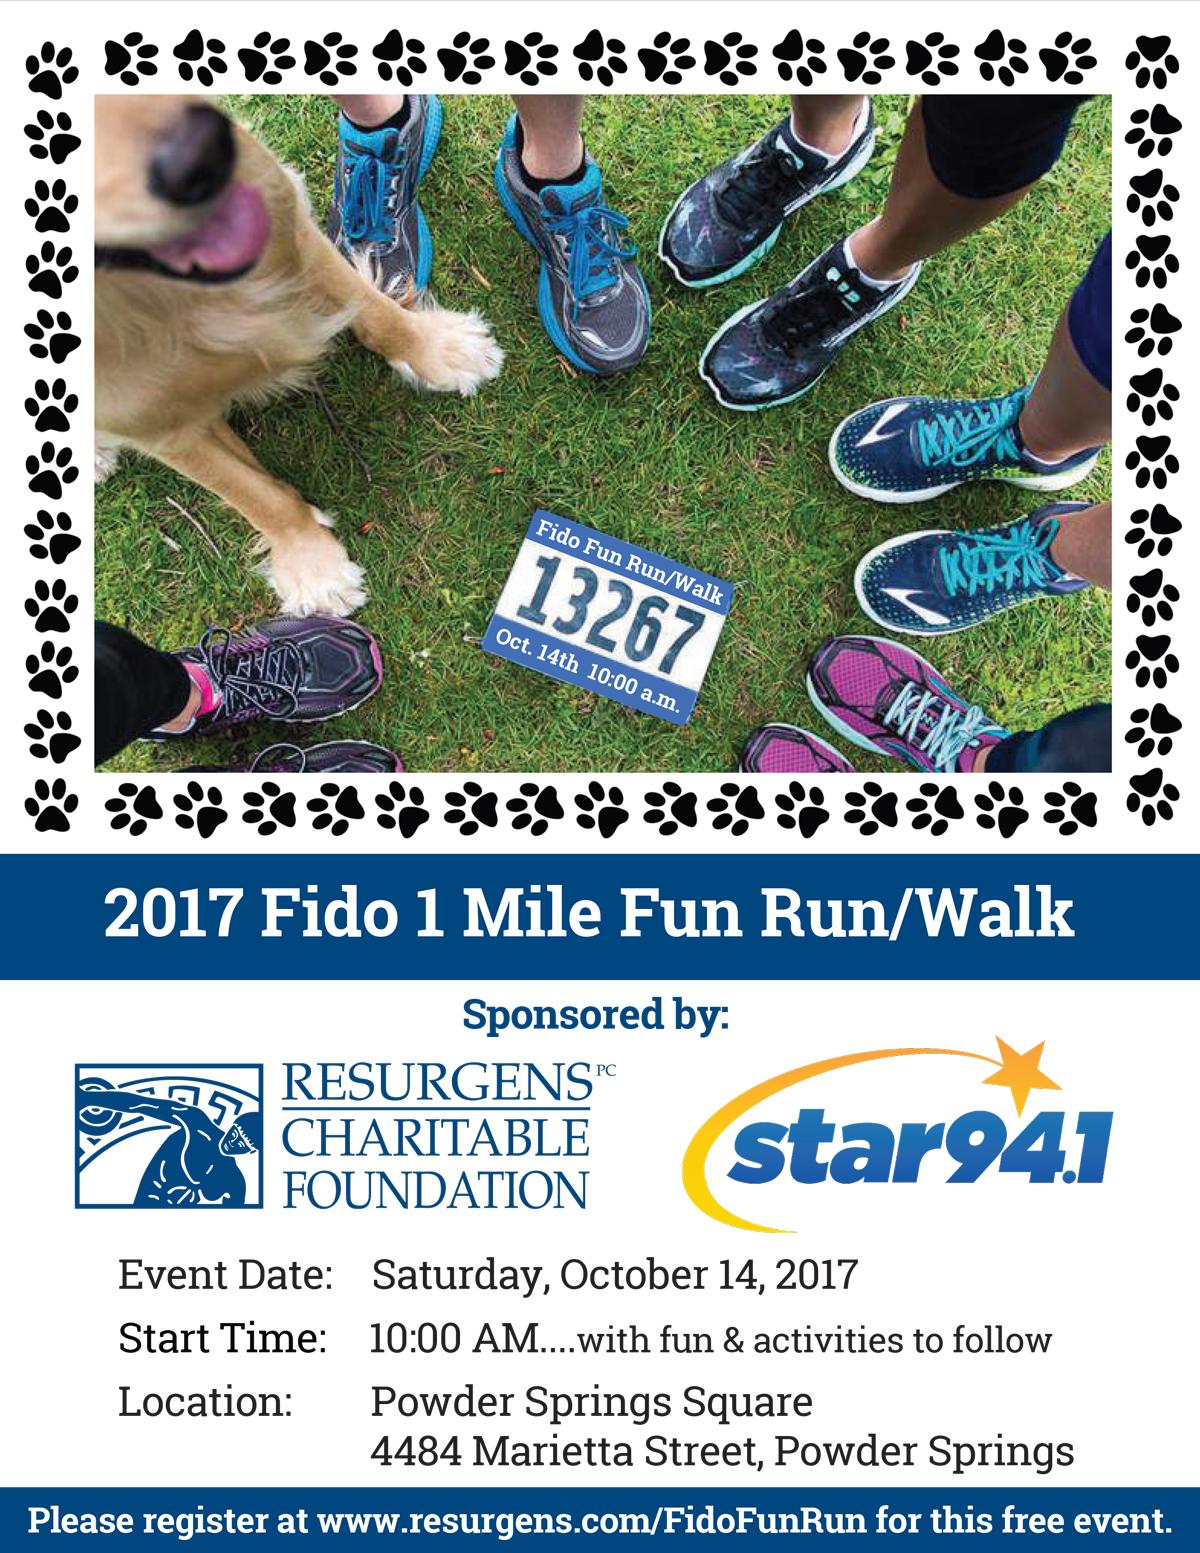 Fido 1-mile Fun Run/Walk October 14, 2017